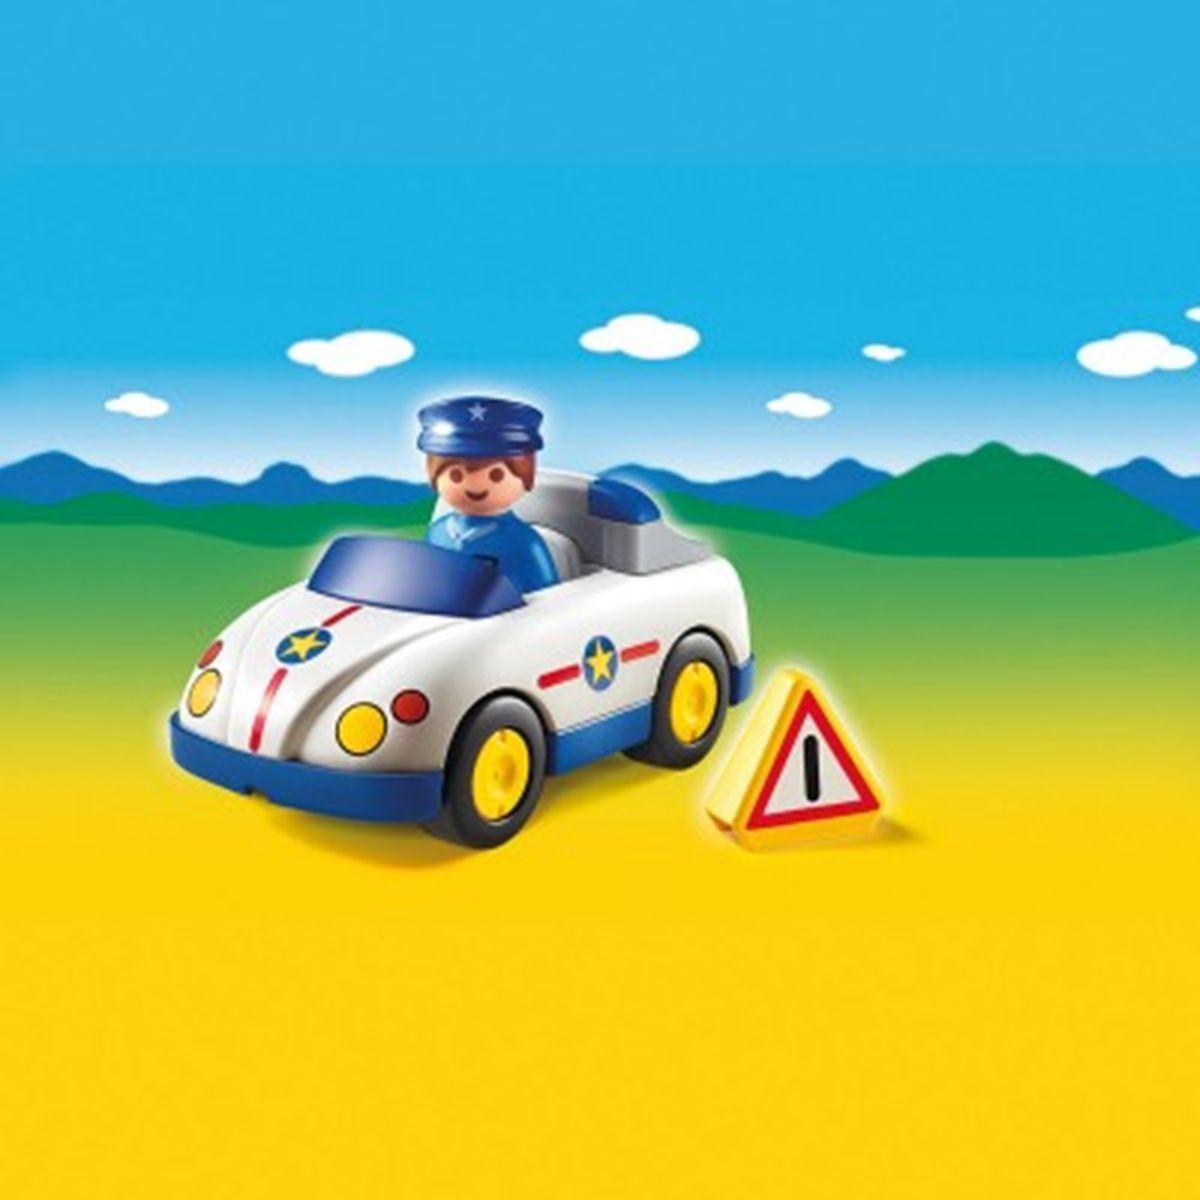 Policier Playmobil 6797 Et Voiture Véhicules La Figurines 2H9WDEYeI